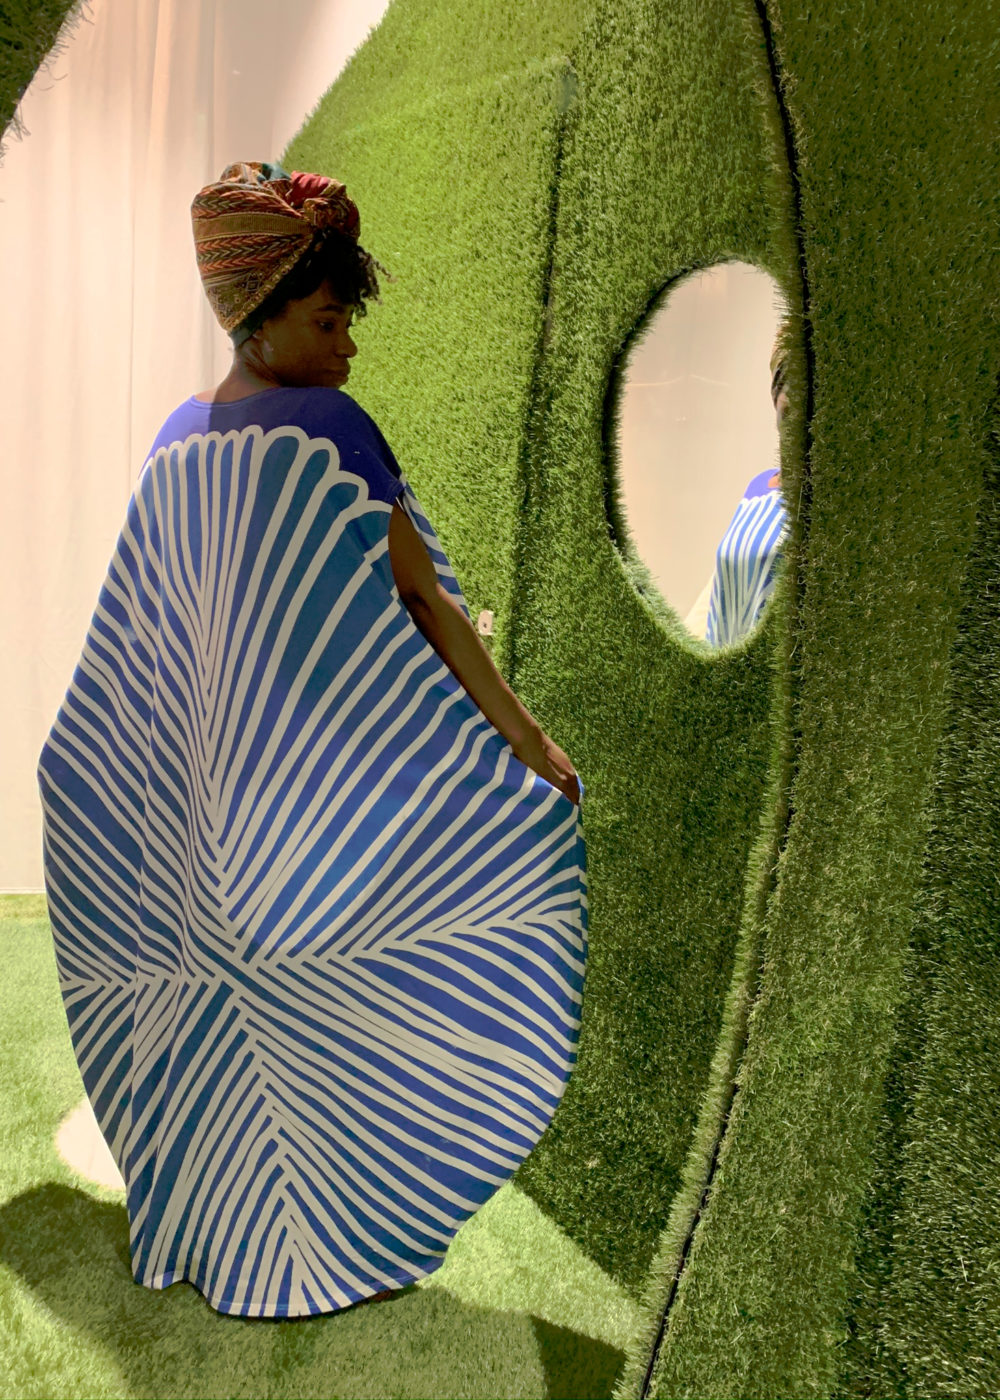 Vimma Dress STIINA Leaf blue one size - blue, Dress, Leaf, one size, Stiina